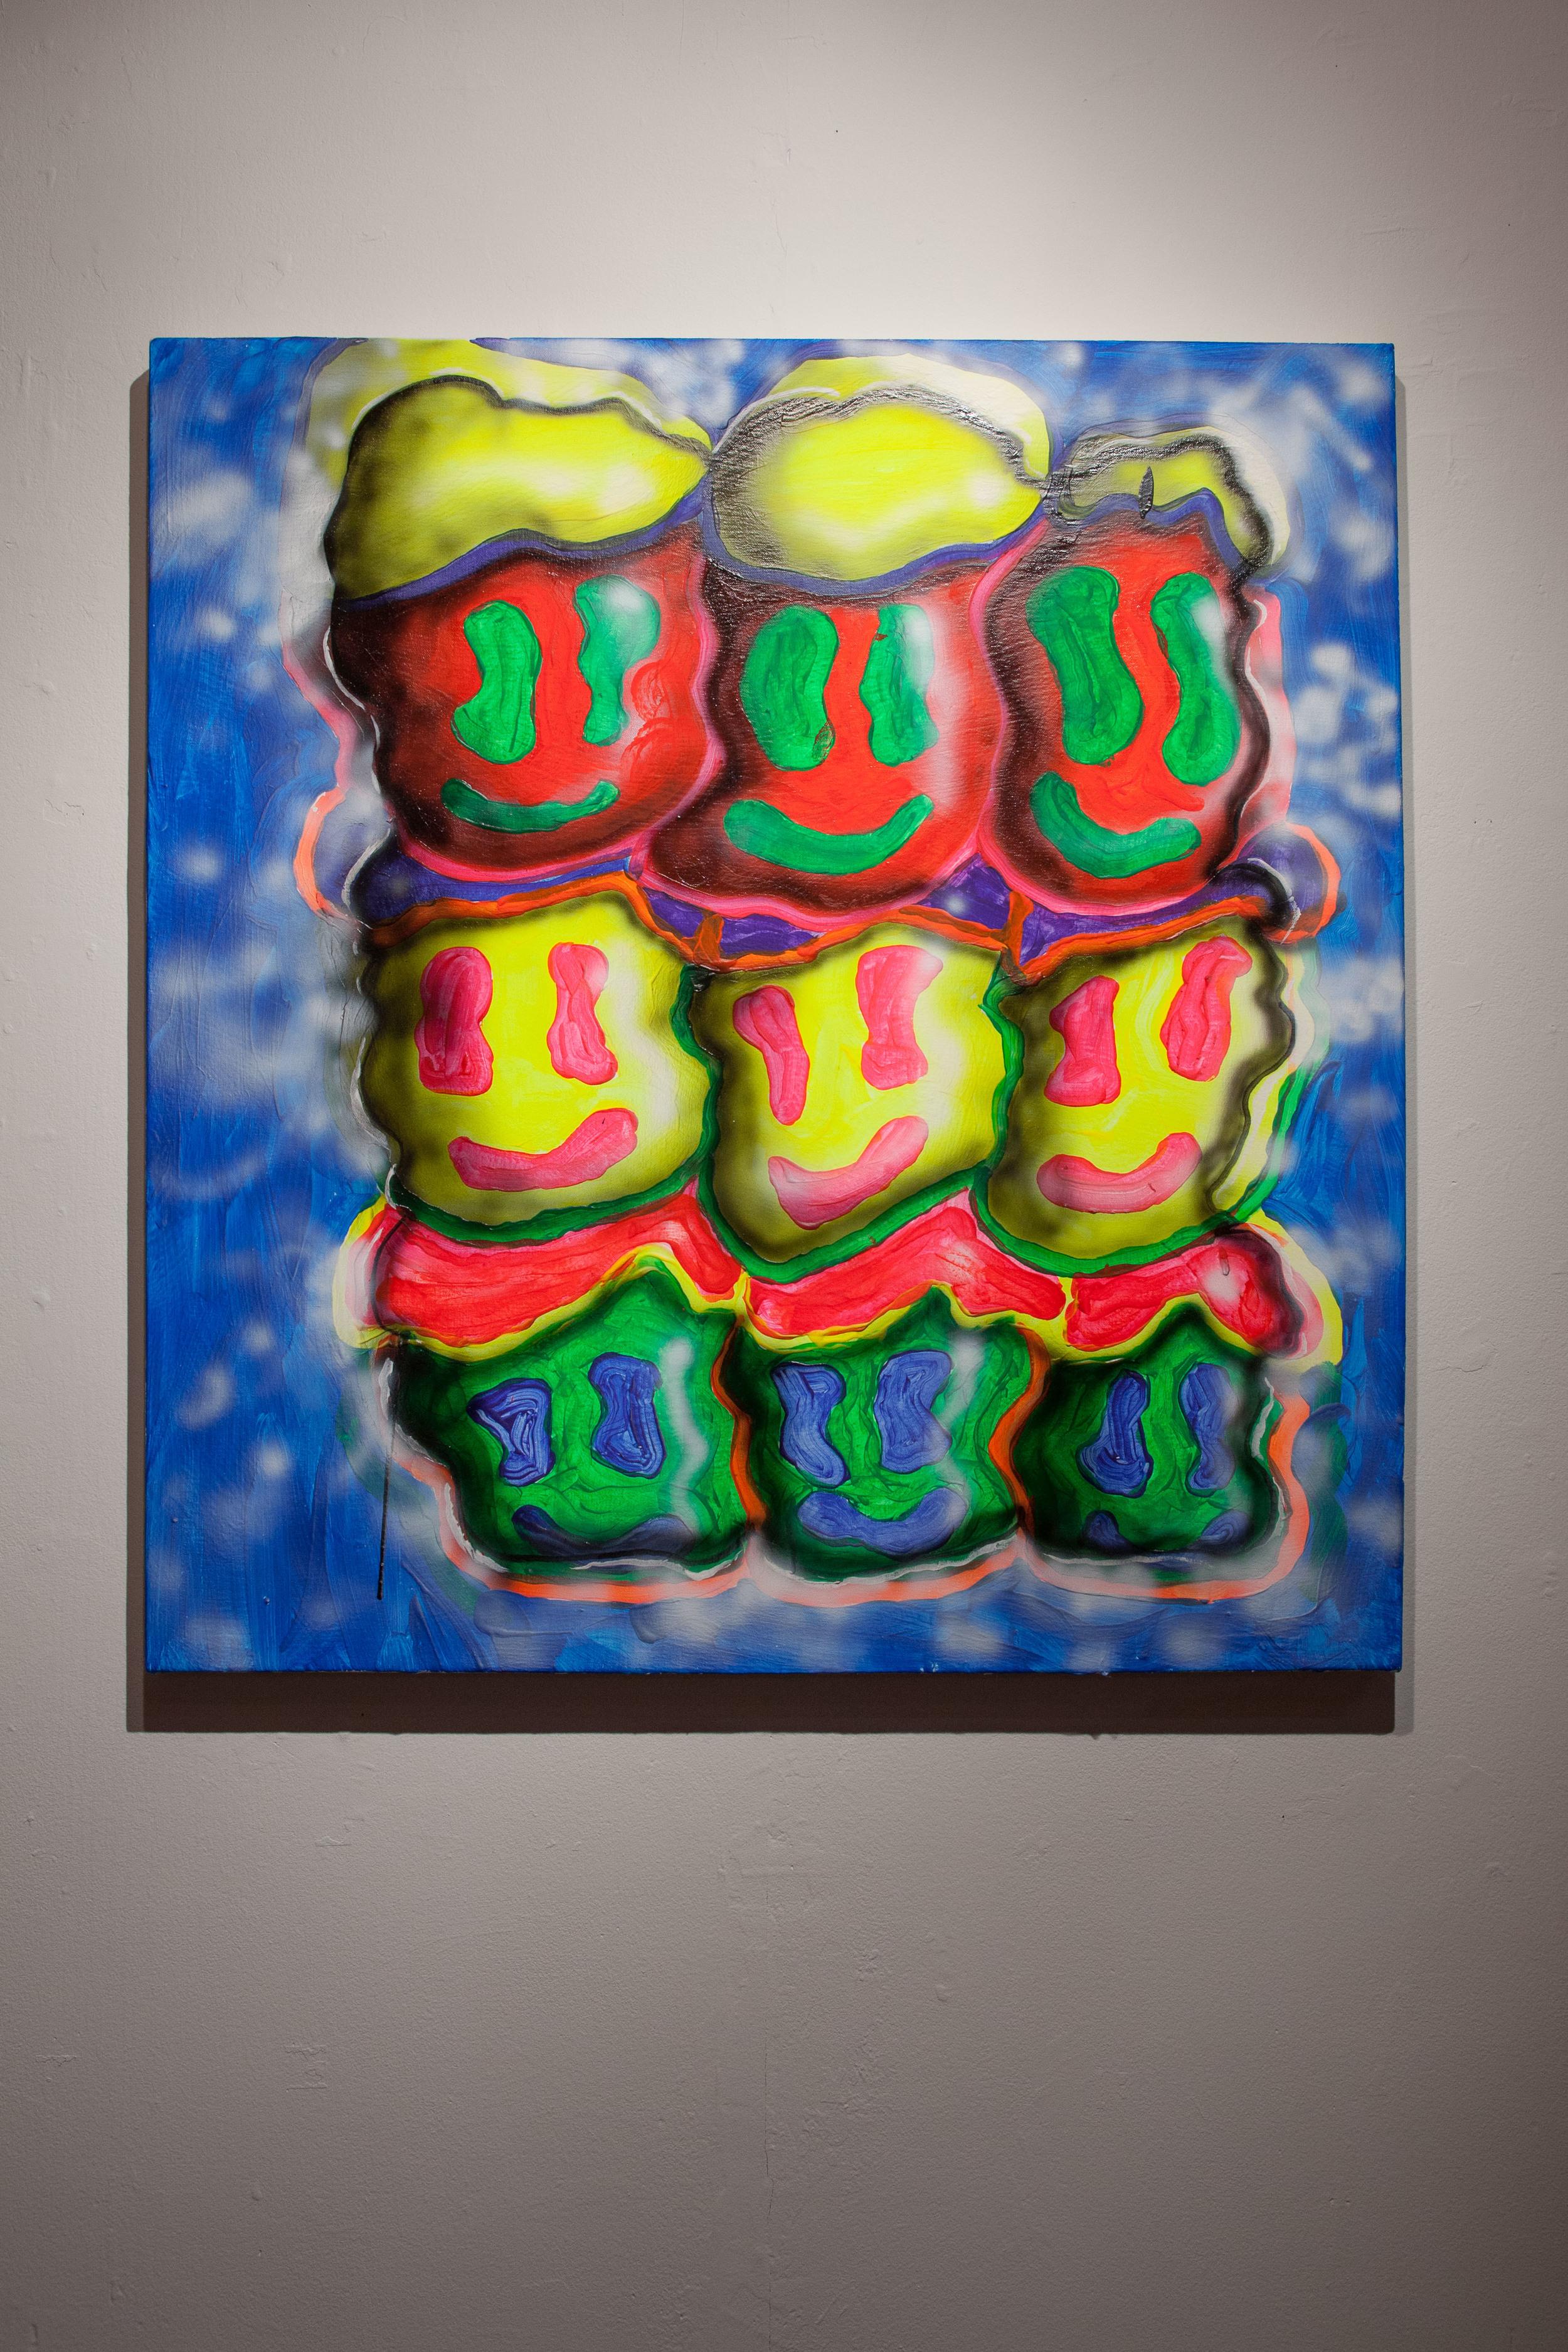 Royal Jarmon,  Synergy? , 2015  Acrylic and Enamel on Canvas, 32 x 30 x 1 1/2 in.